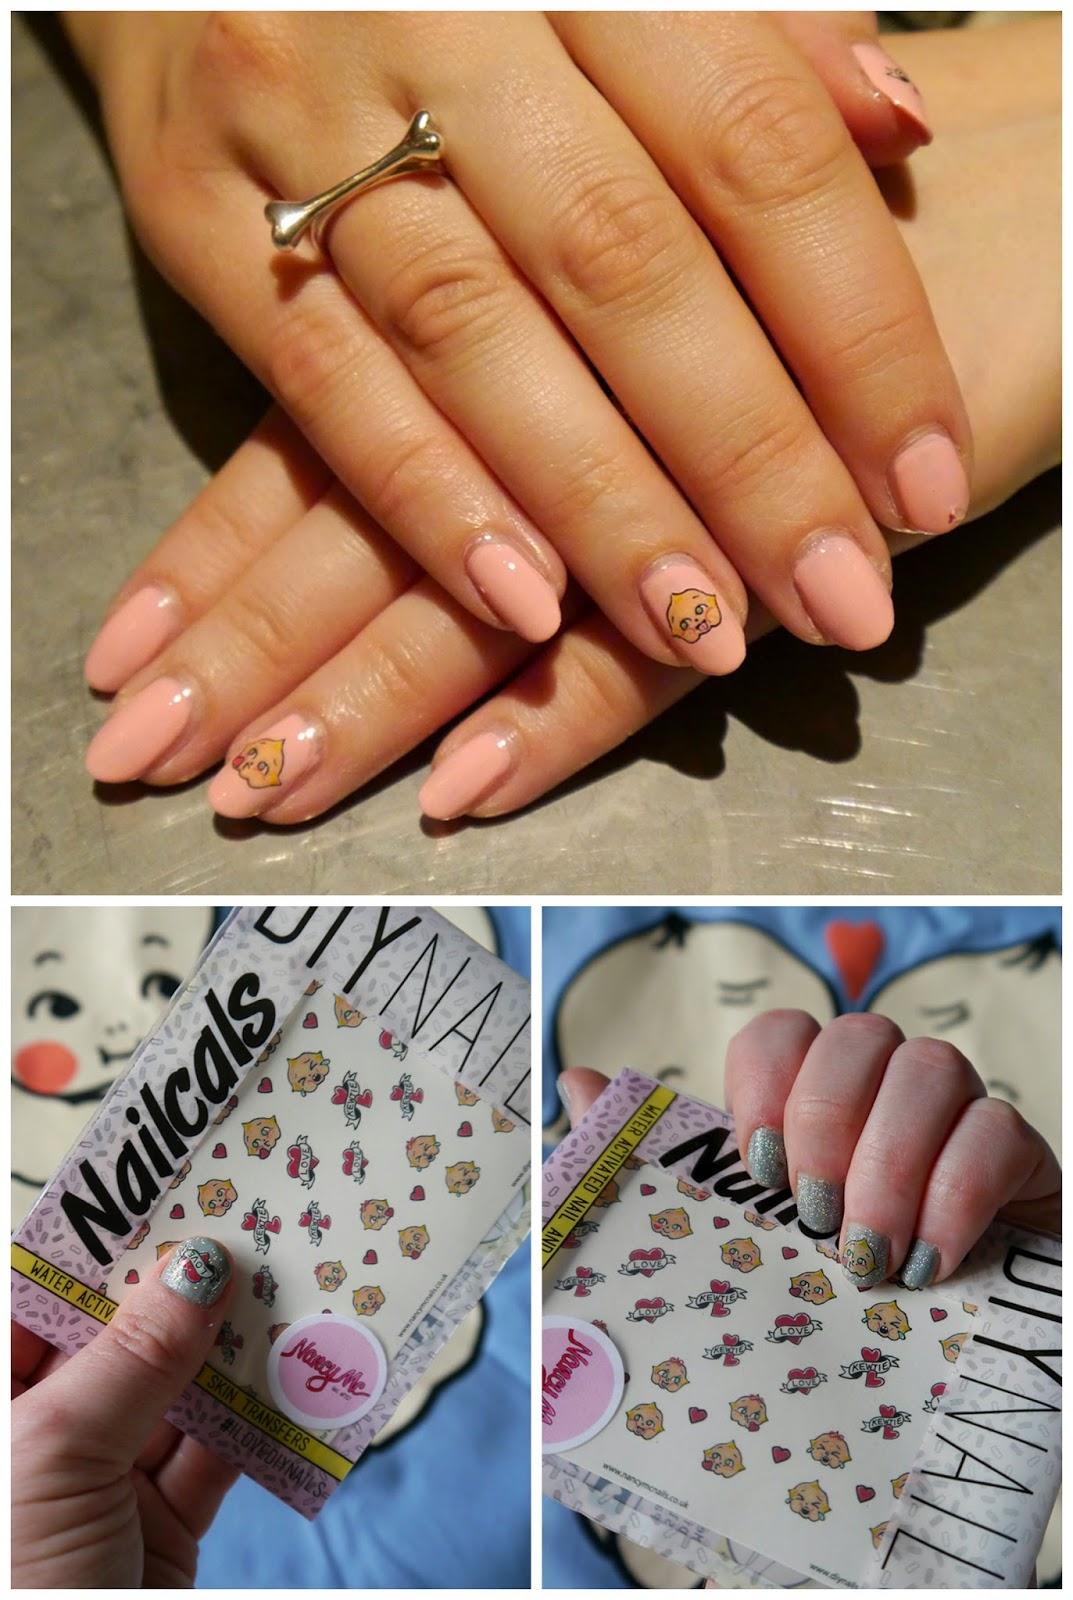 Abandon Ship Apparel, Kewpie collection, Kewpie Party, Glasgow, DIY Nails, Scottish Bloggers, Sacha Make Up, Sacha Nails, Kewpie nails, Nail art, DIY Nails